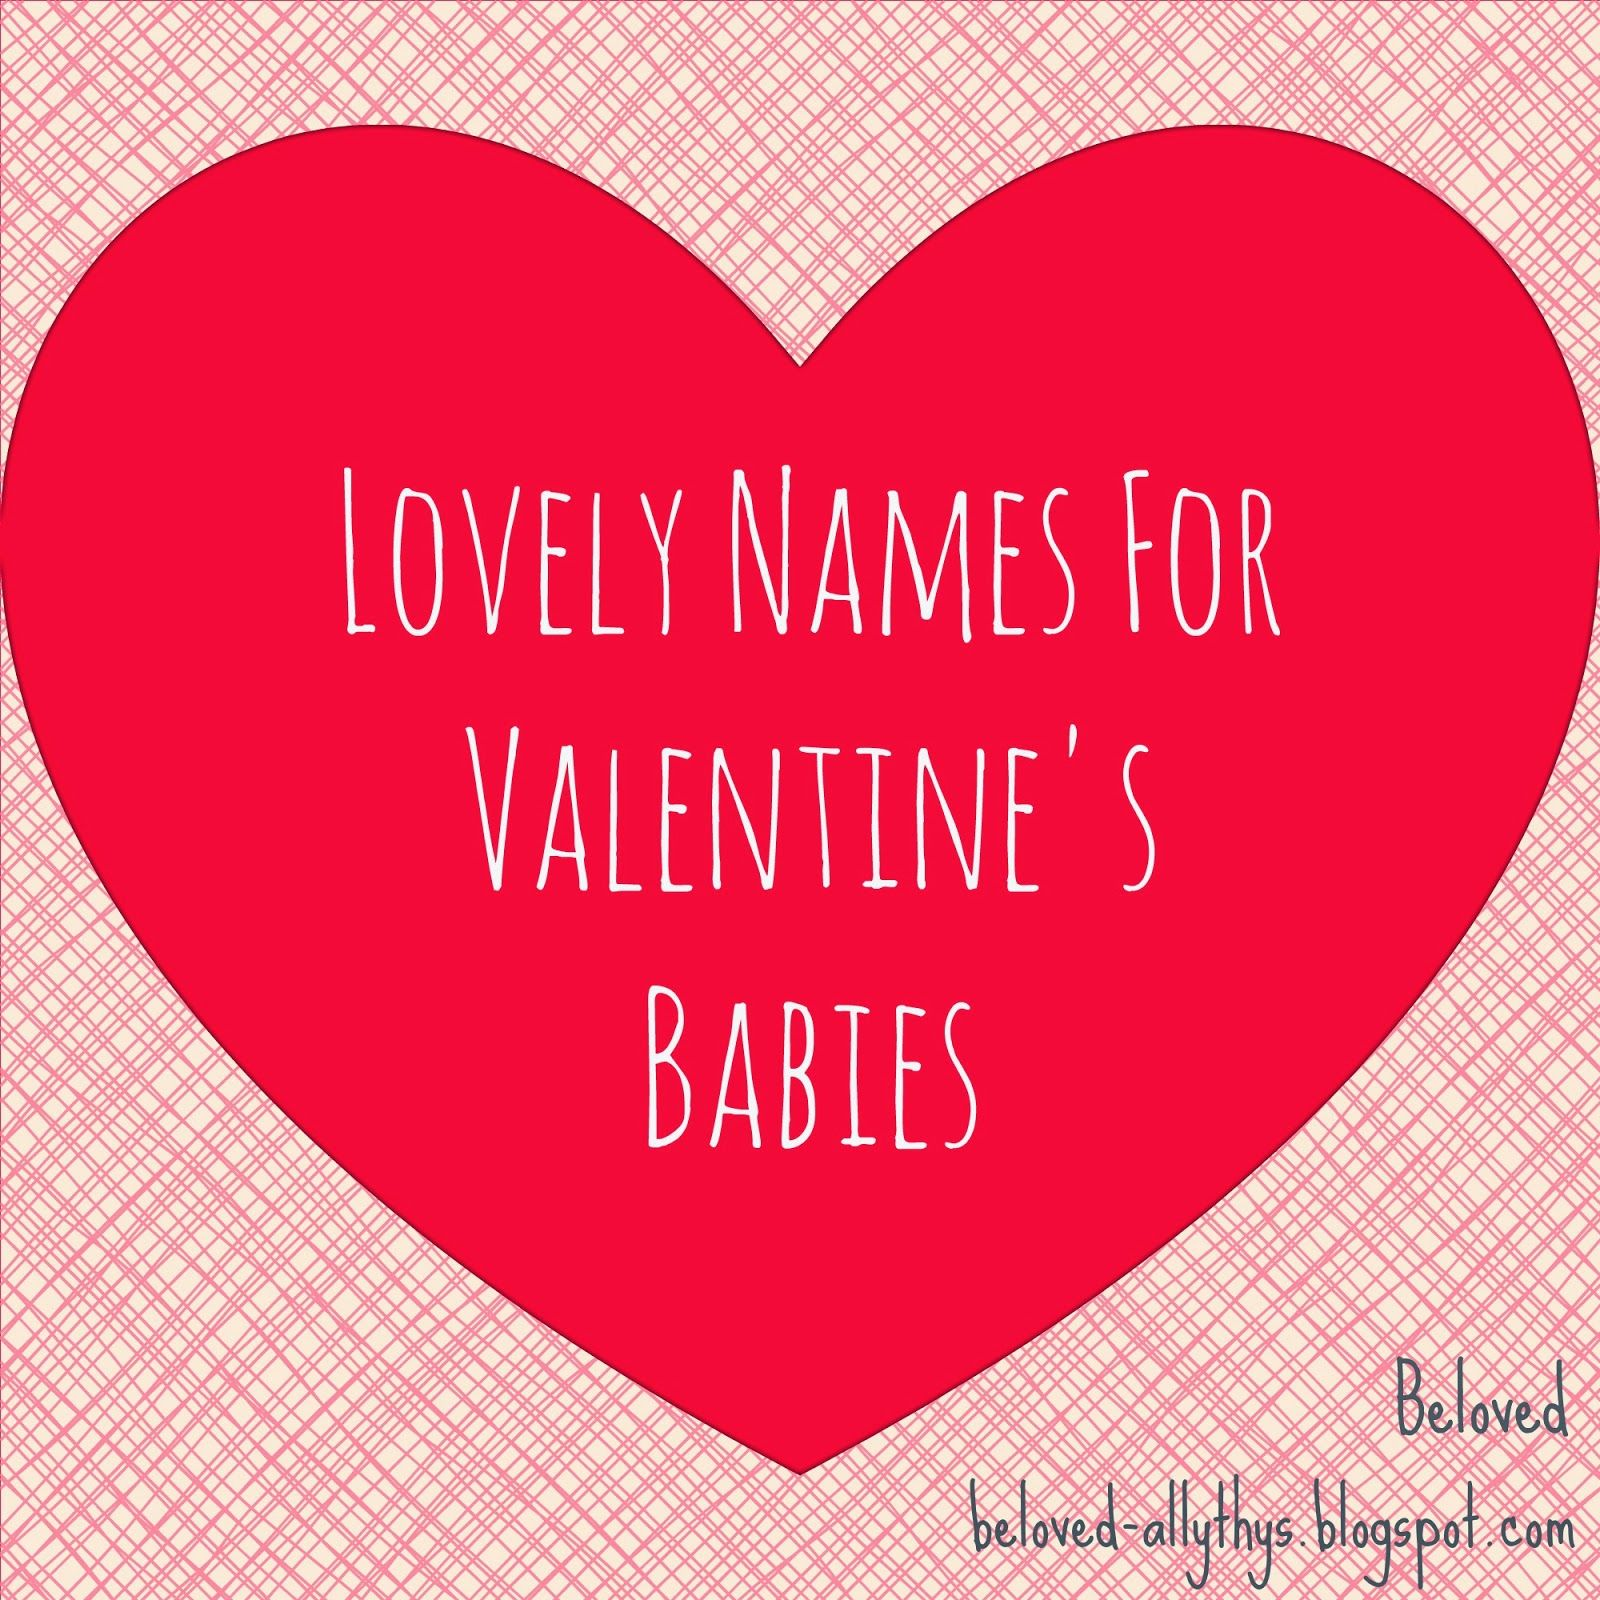 beloved lovely names for valentines babies - Valentines Names